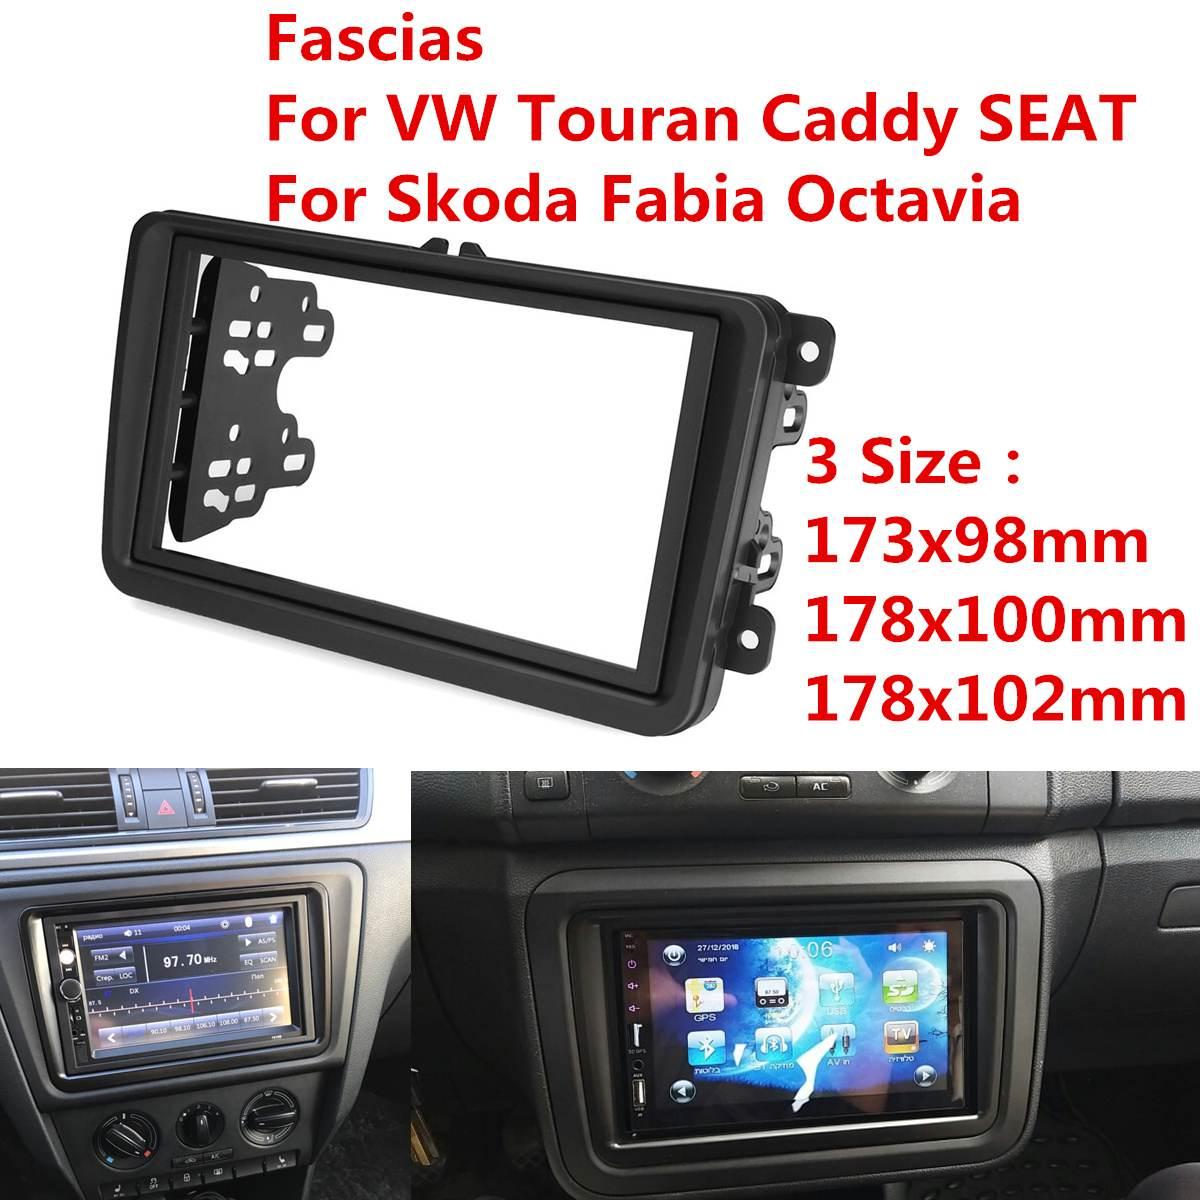 2 Din Araba Radyo Fasya Fascias Paneli Çerçeve CD DVD Dash Ses Iç Volkswagen VW Touran Caddy SEAT Skoda fabia Octavia